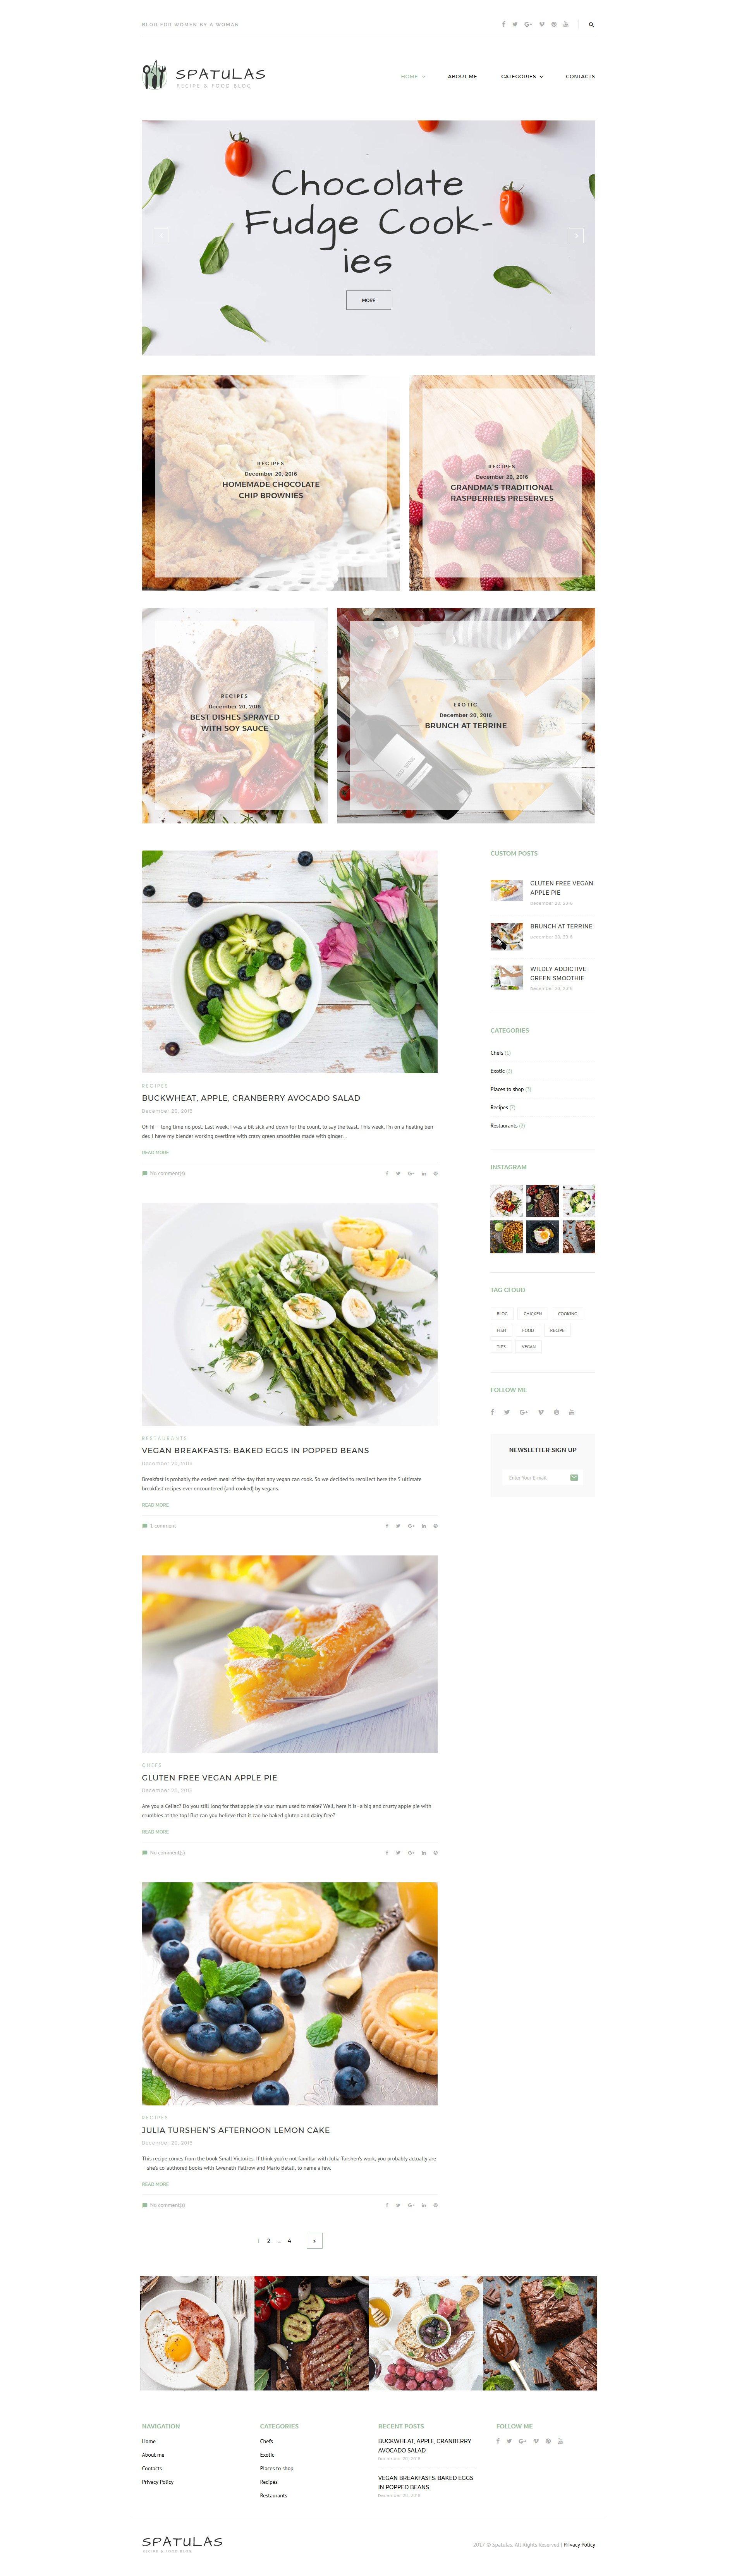 """Spatulas - Recipe & Food Blog"" Responsive WordPress thema №63601 - screenshot"